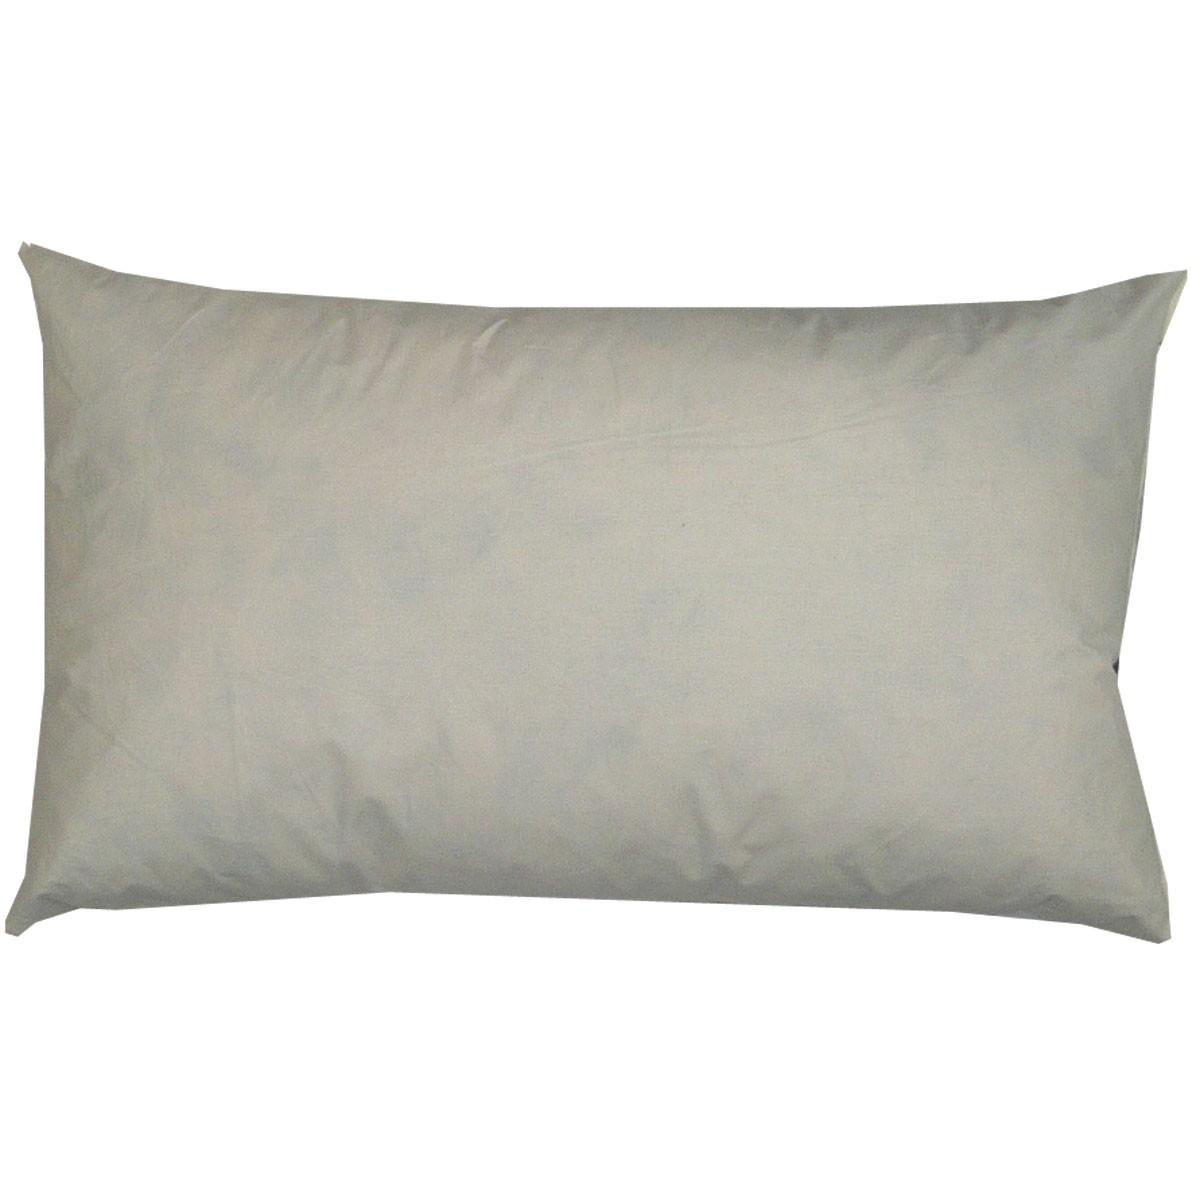 kissenf llung f llkissen kissen inlett federn 30x50cm. Black Bedroom Furniture Sets. Home Design Ideas